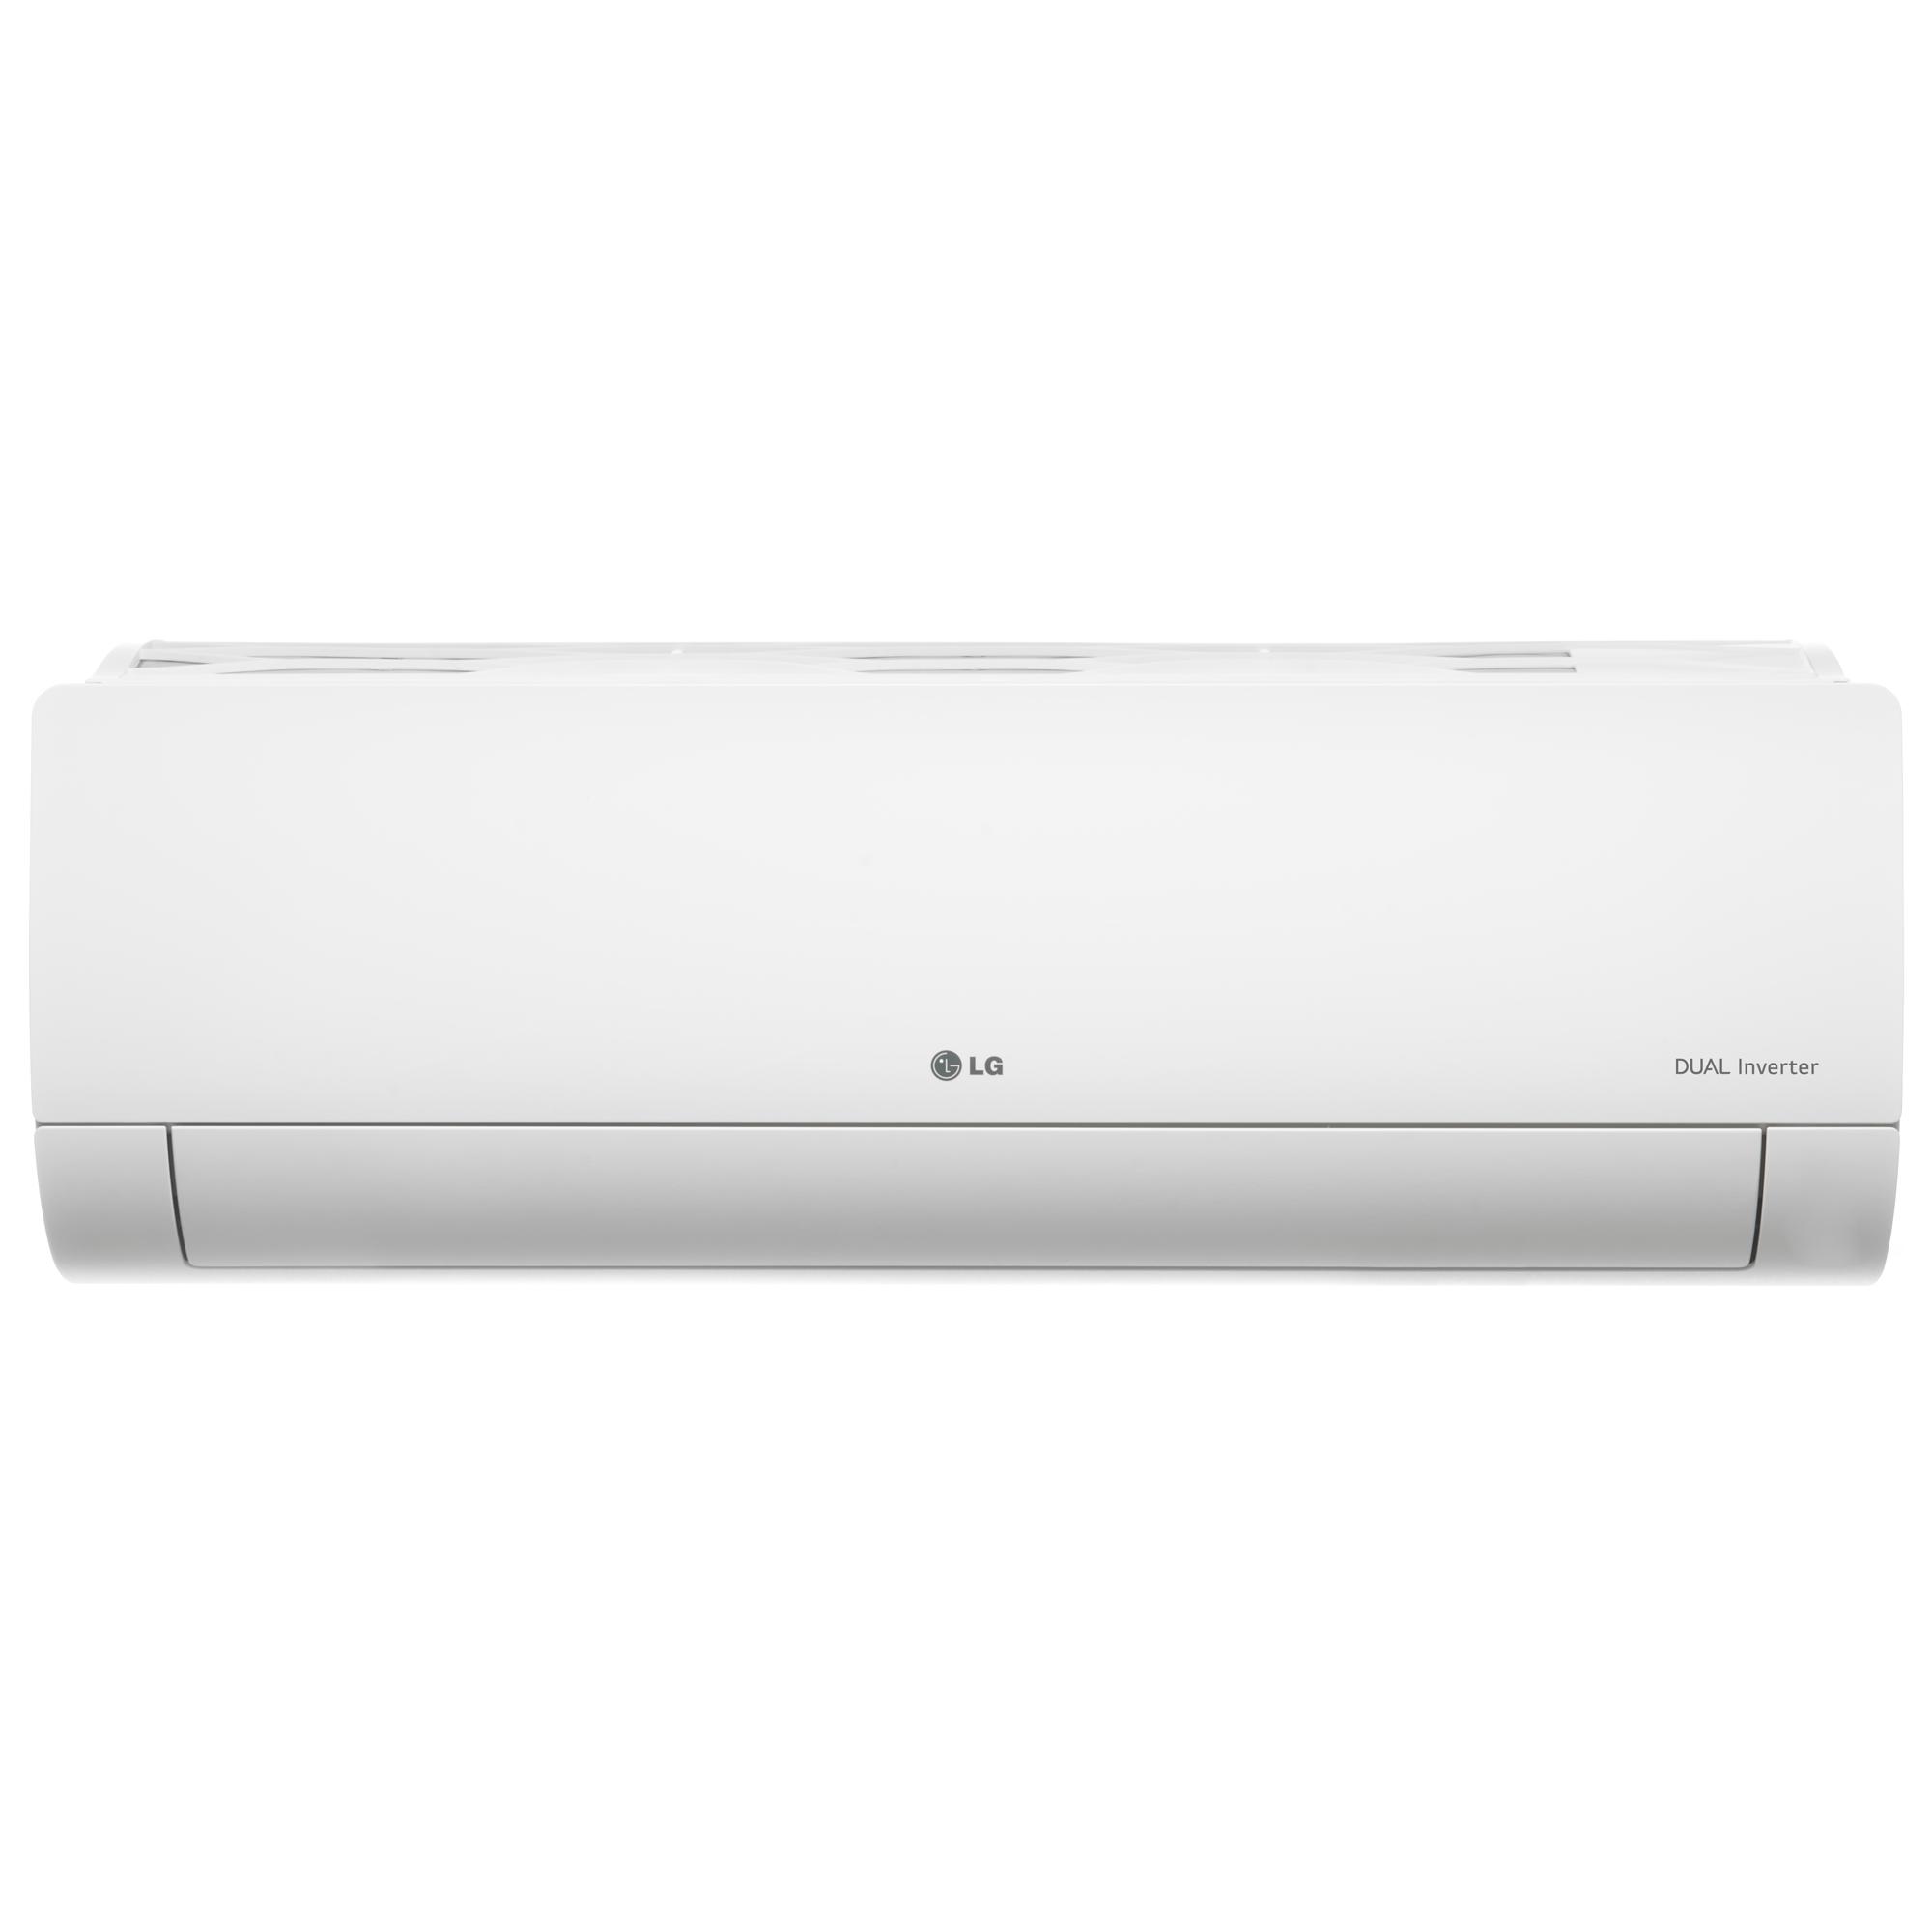 LG 1.5 Ton 4 Star Inverter Split AC (Air Purification Function, Copper Condenser, MS-Q18UVYA, White)_1